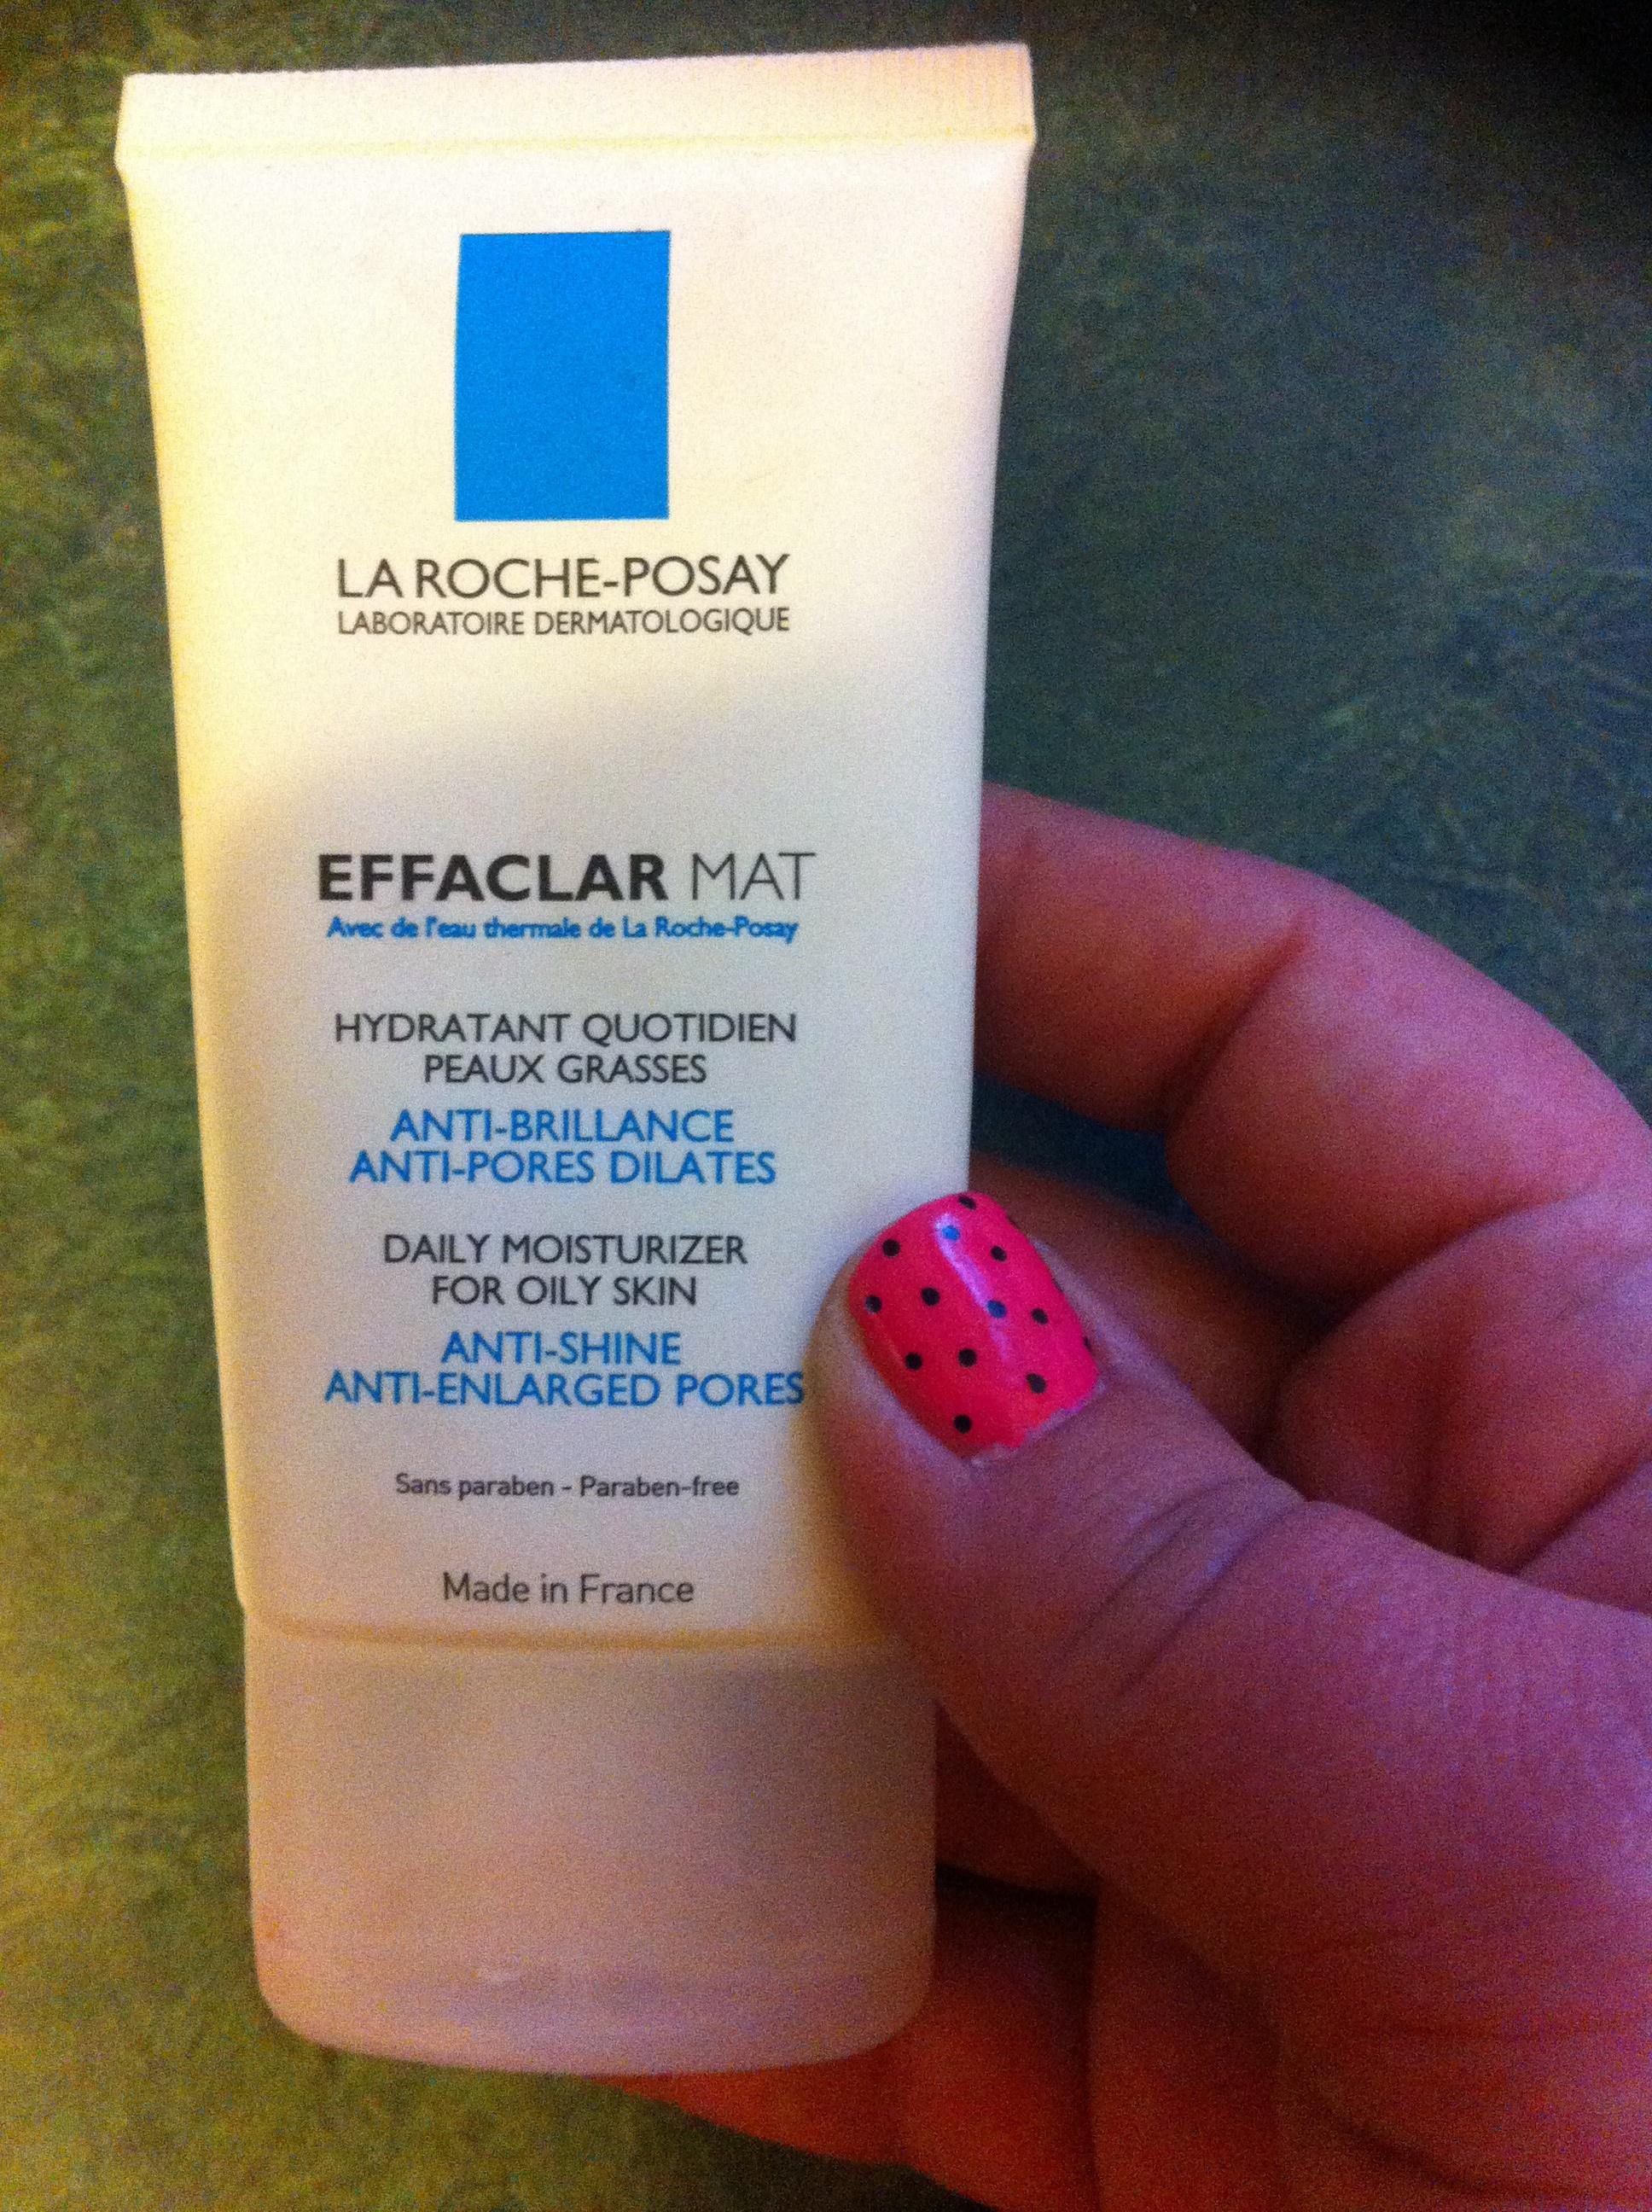 mats la acne mat catalog care effaclar boxpharmacy face duo posay gr en roche